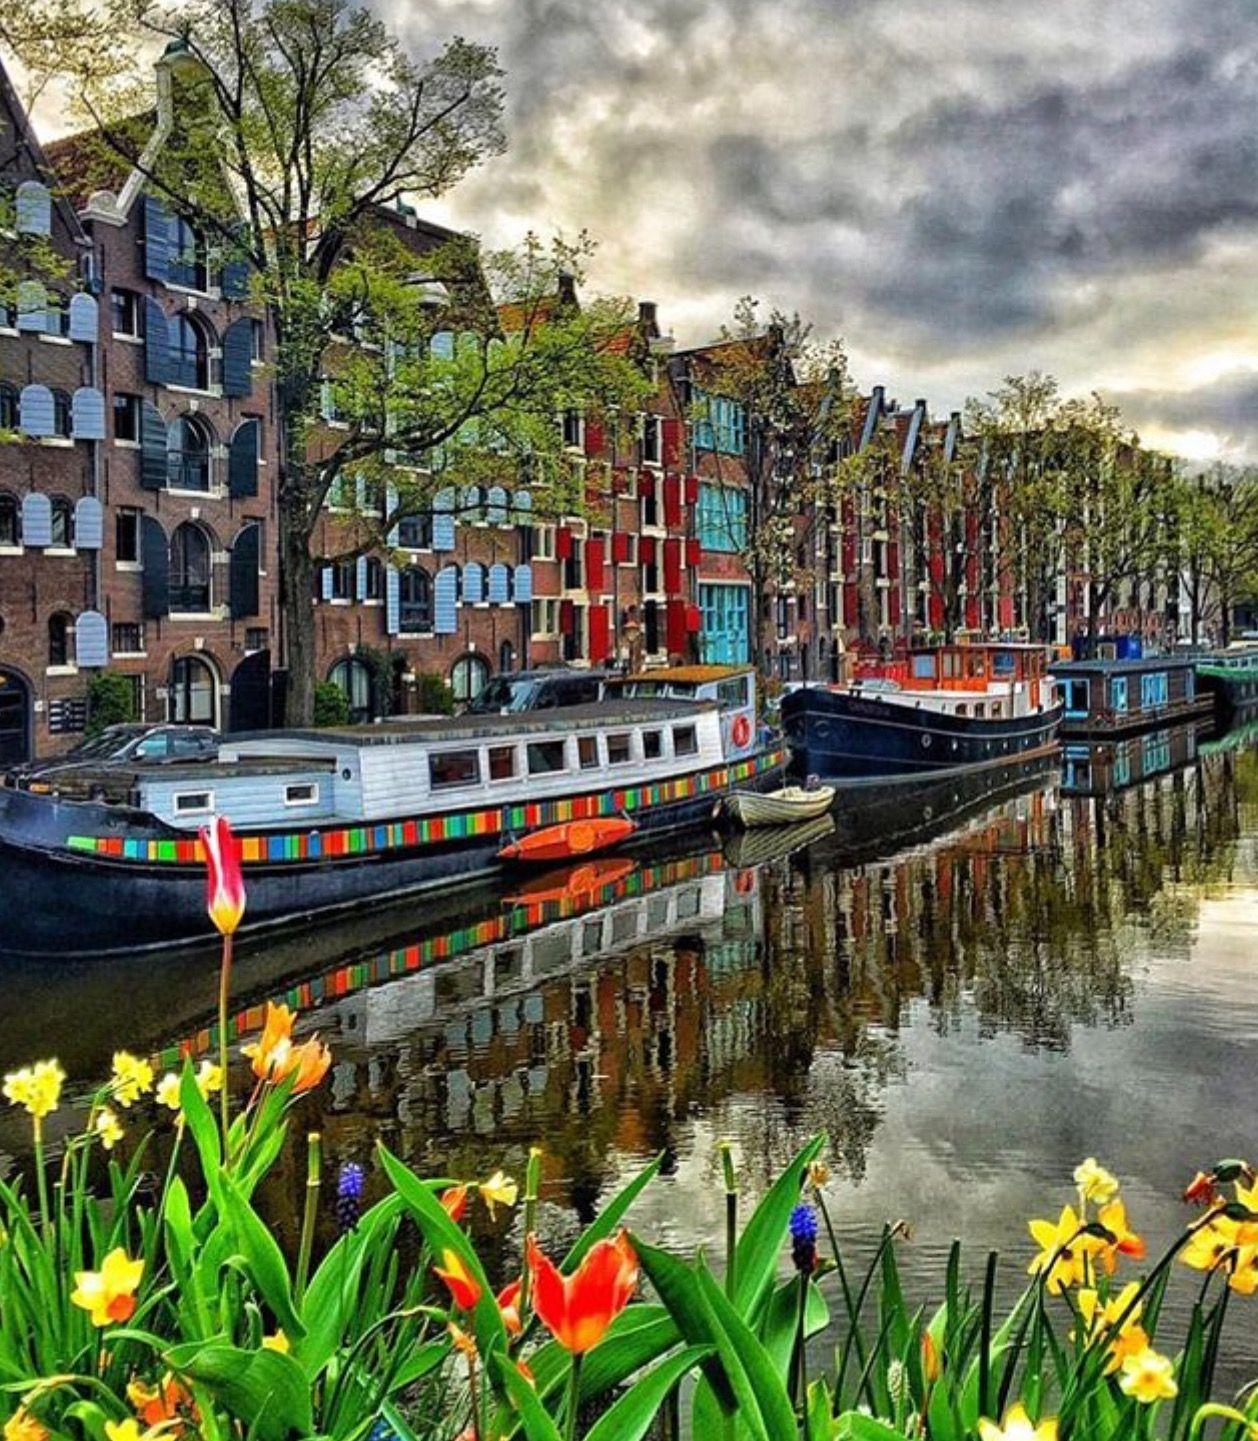 Foto de @c.bezerra fotos - Amesterdam.